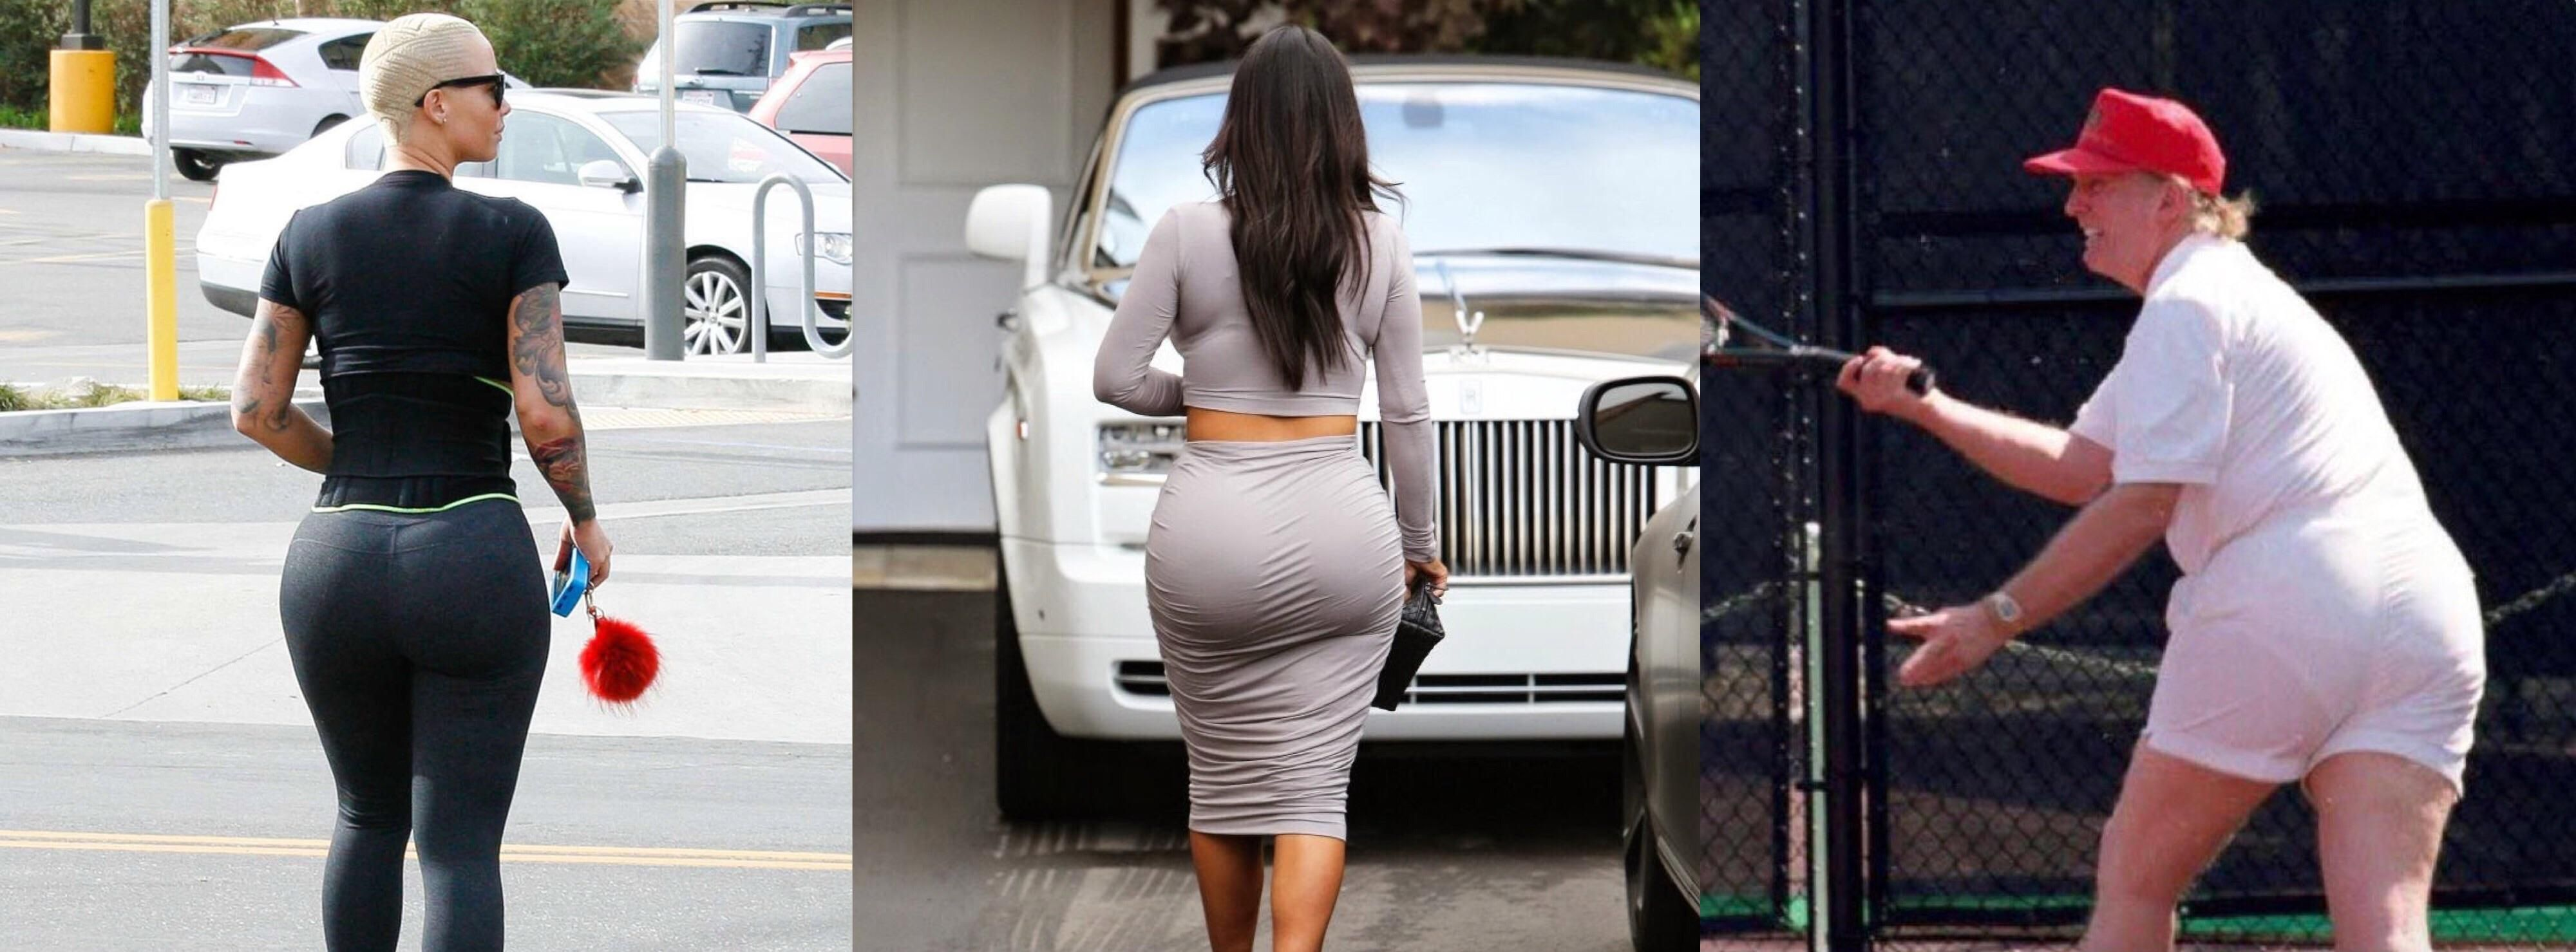 Kanye definitely has a type